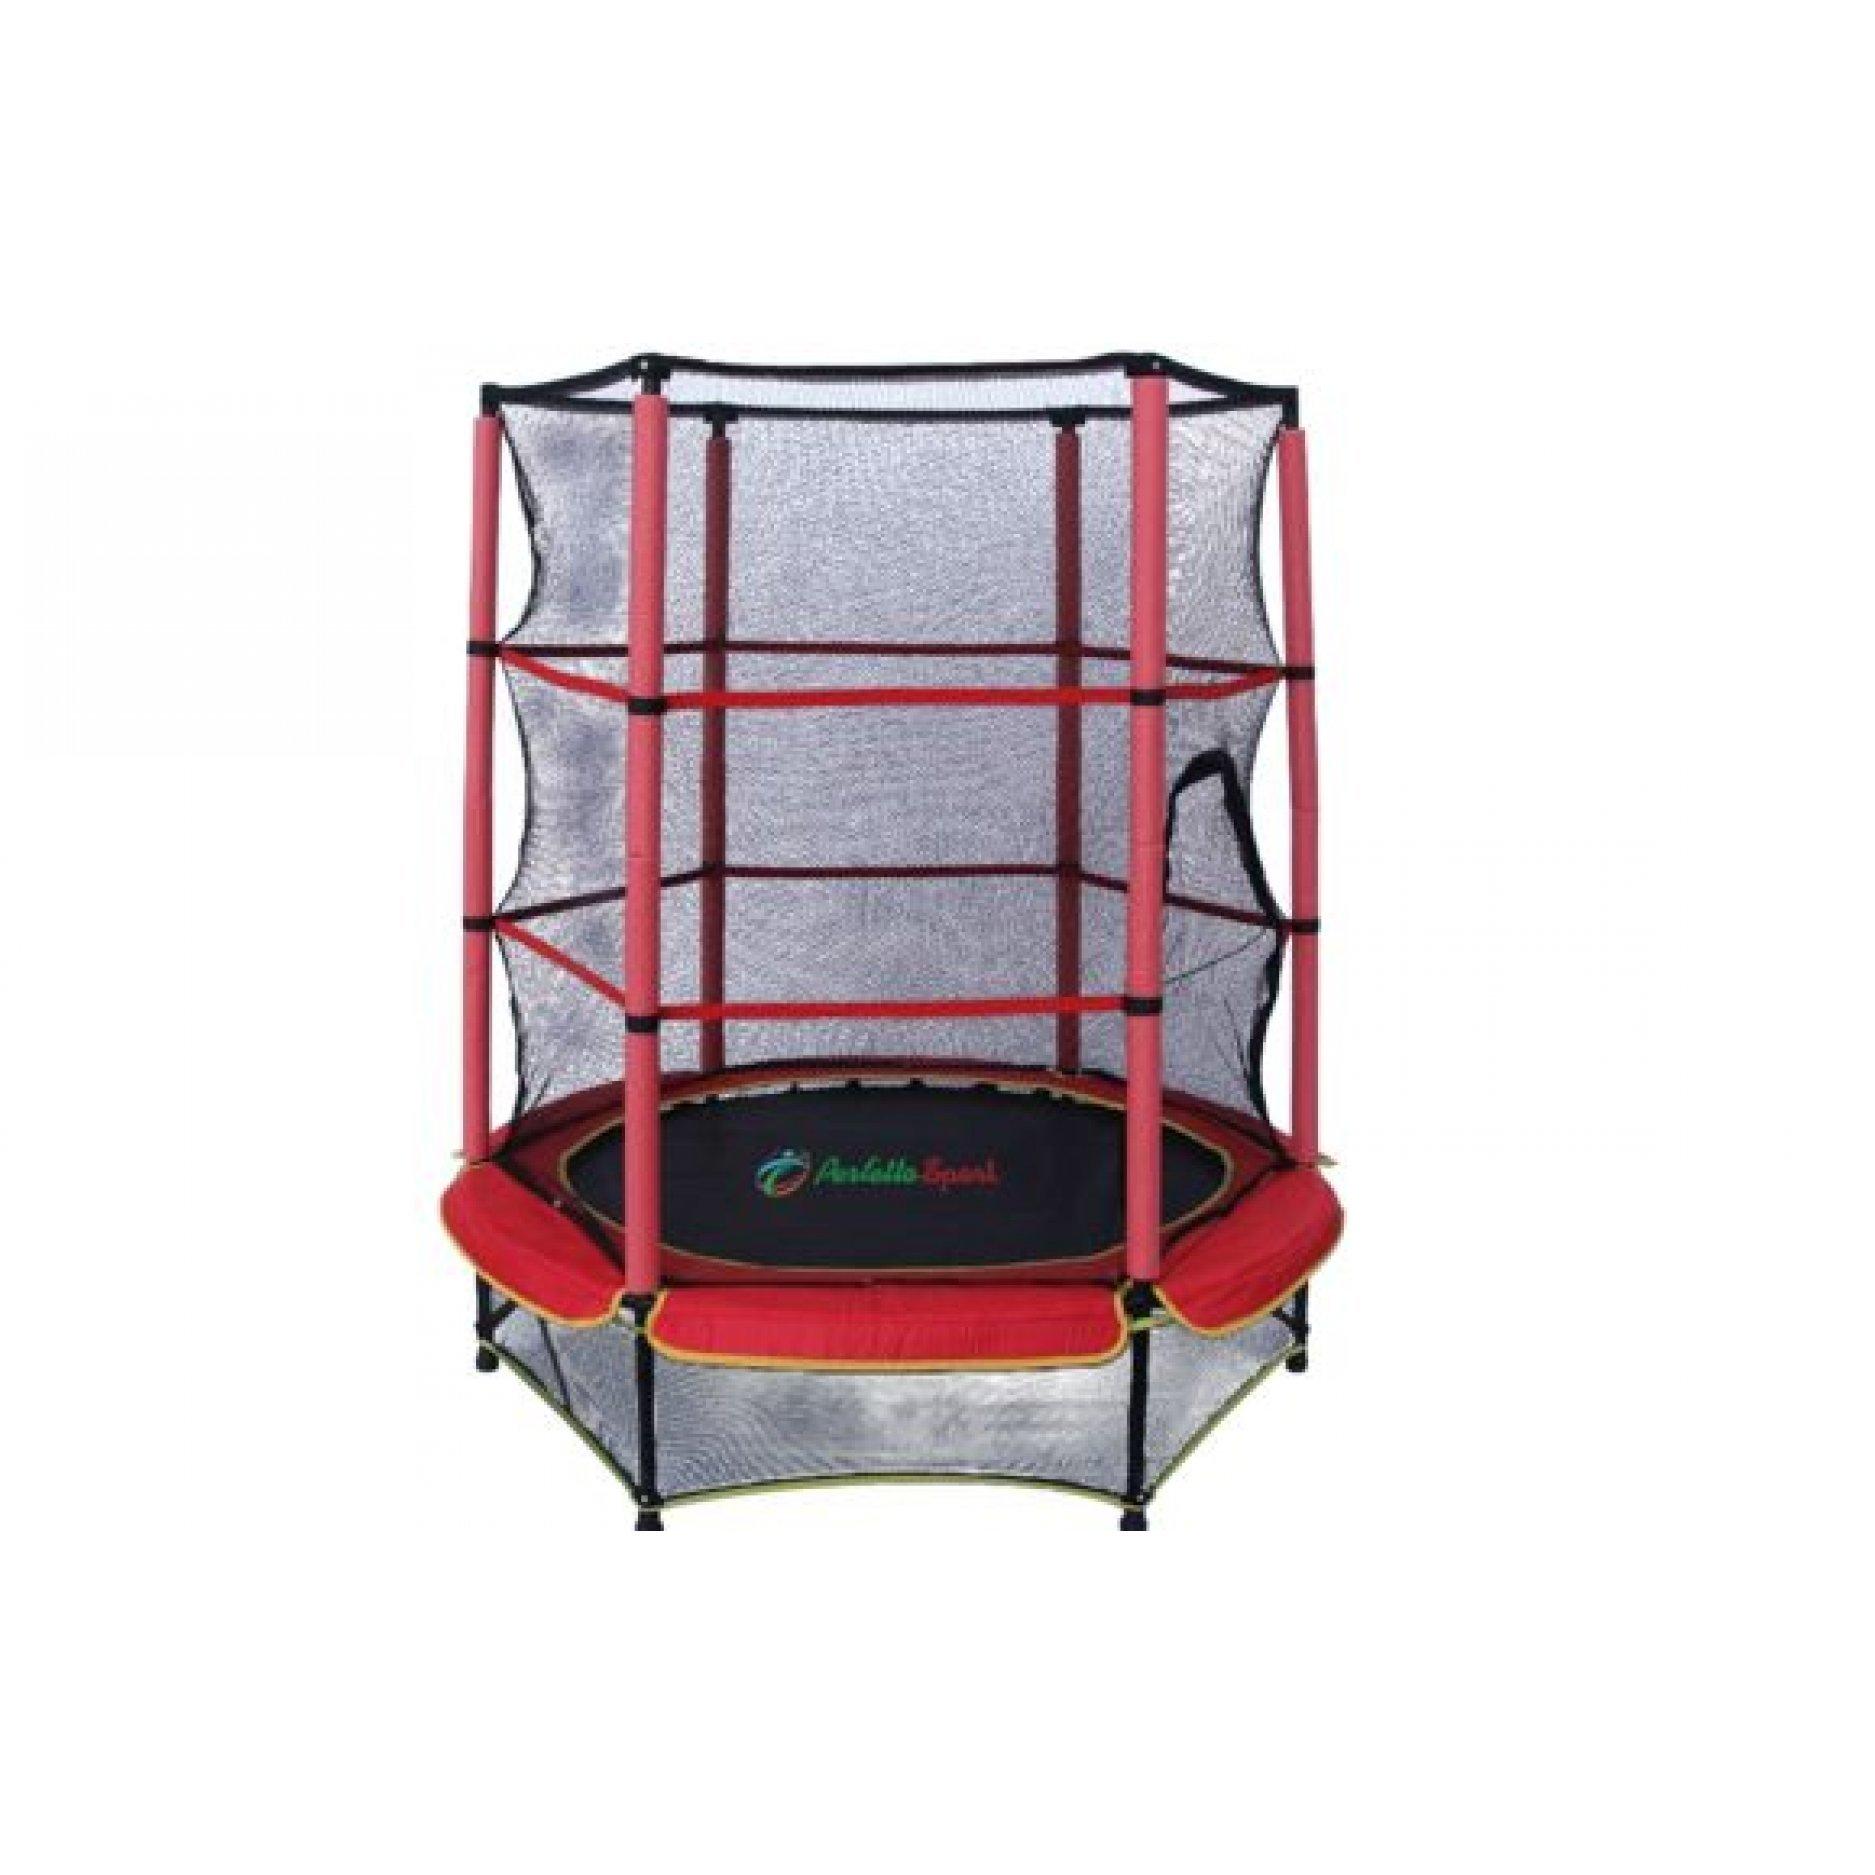 Батут Perfetto Sport 4,5 диаметр 1,4 м